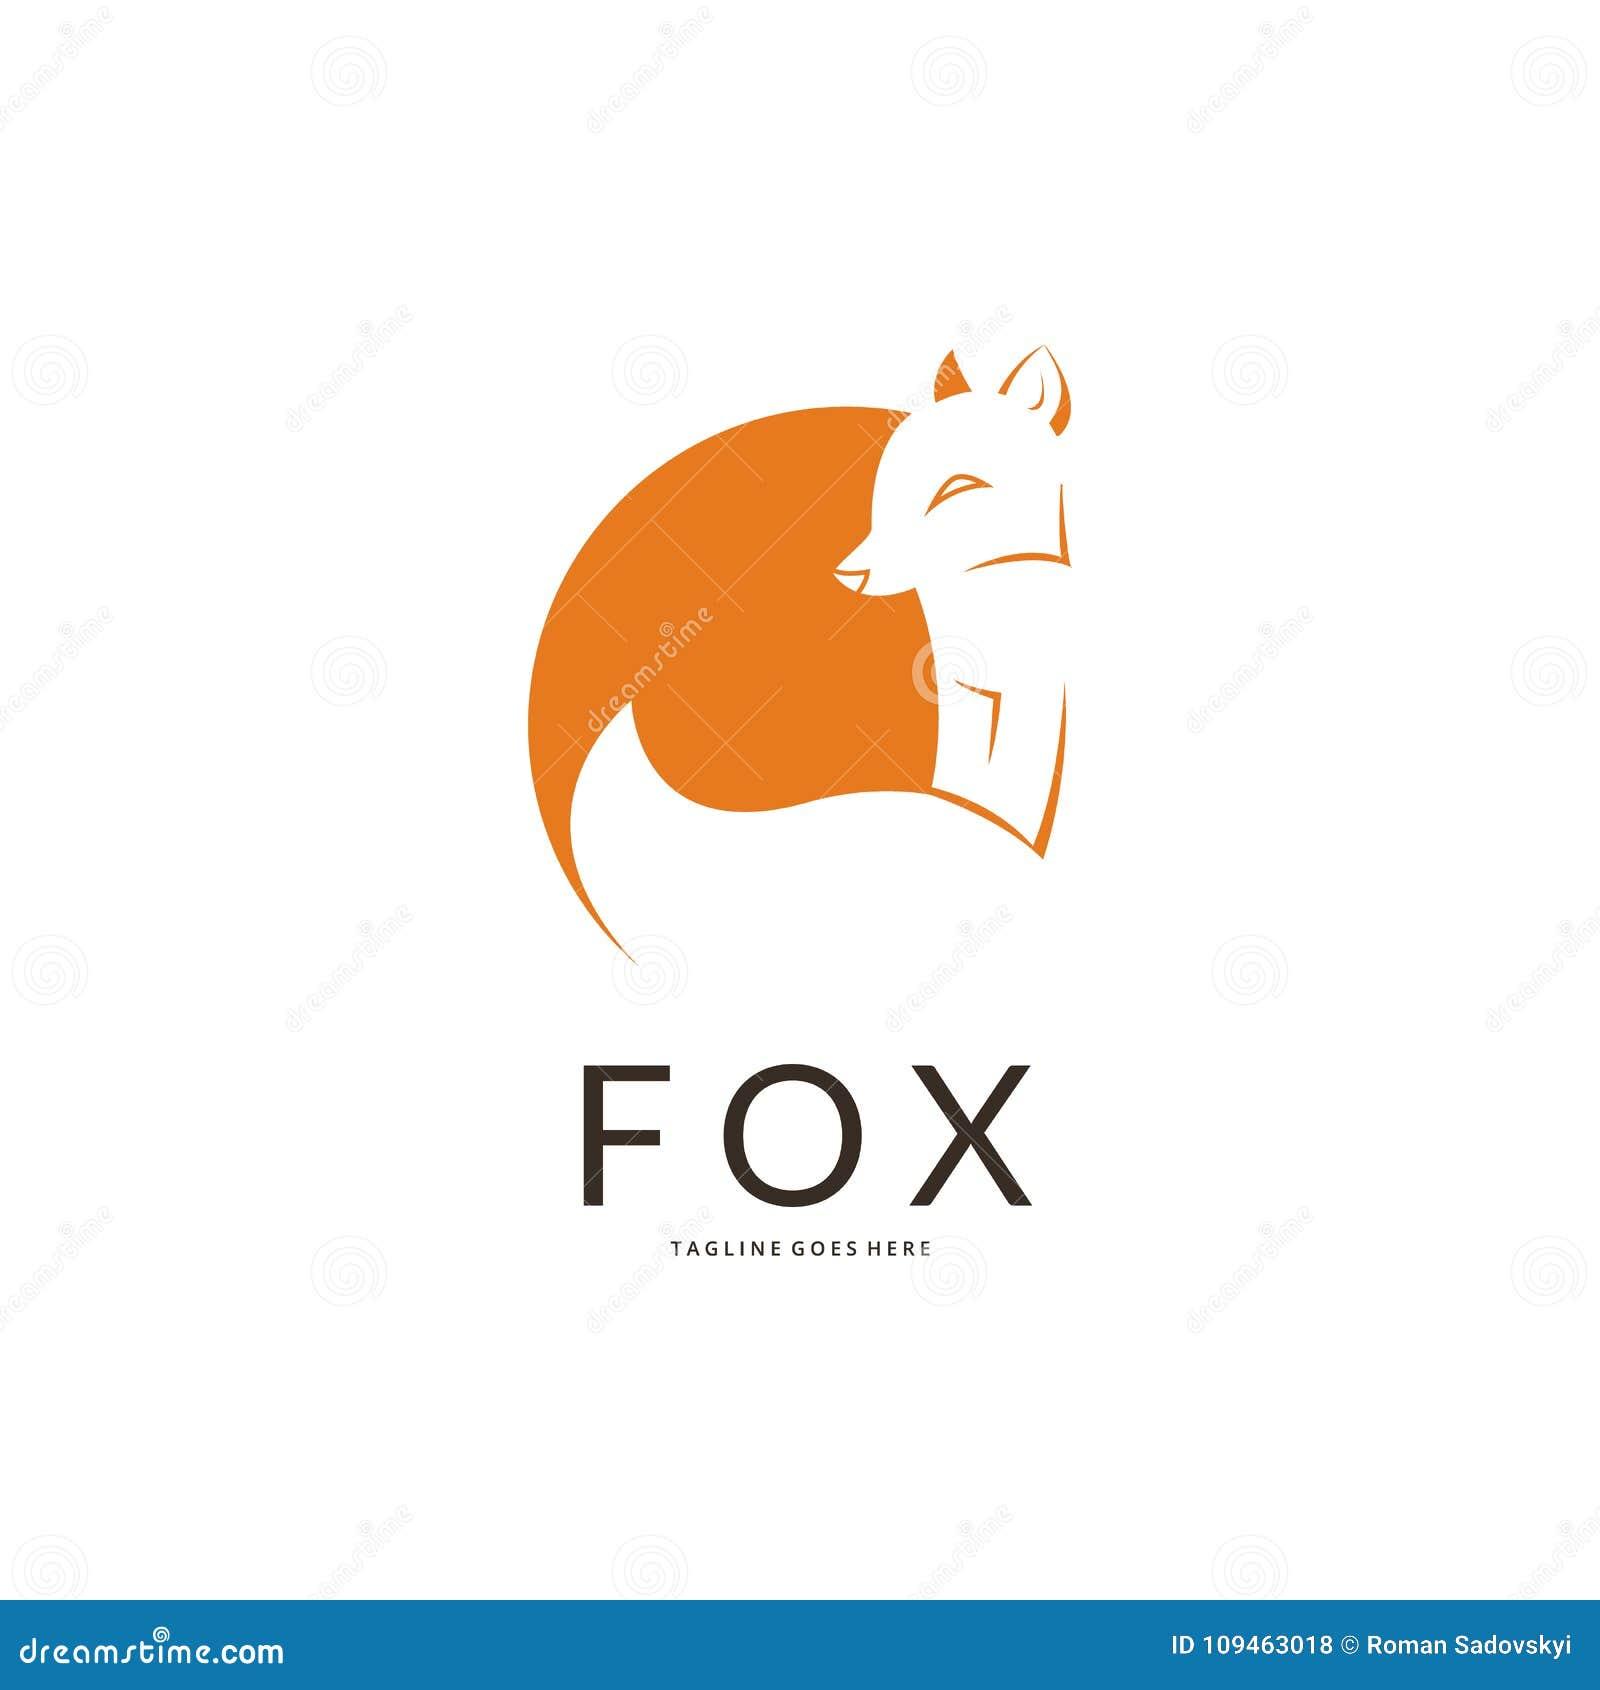 Fox Logo Vector Image Of A Fox Design On A White Background Vector